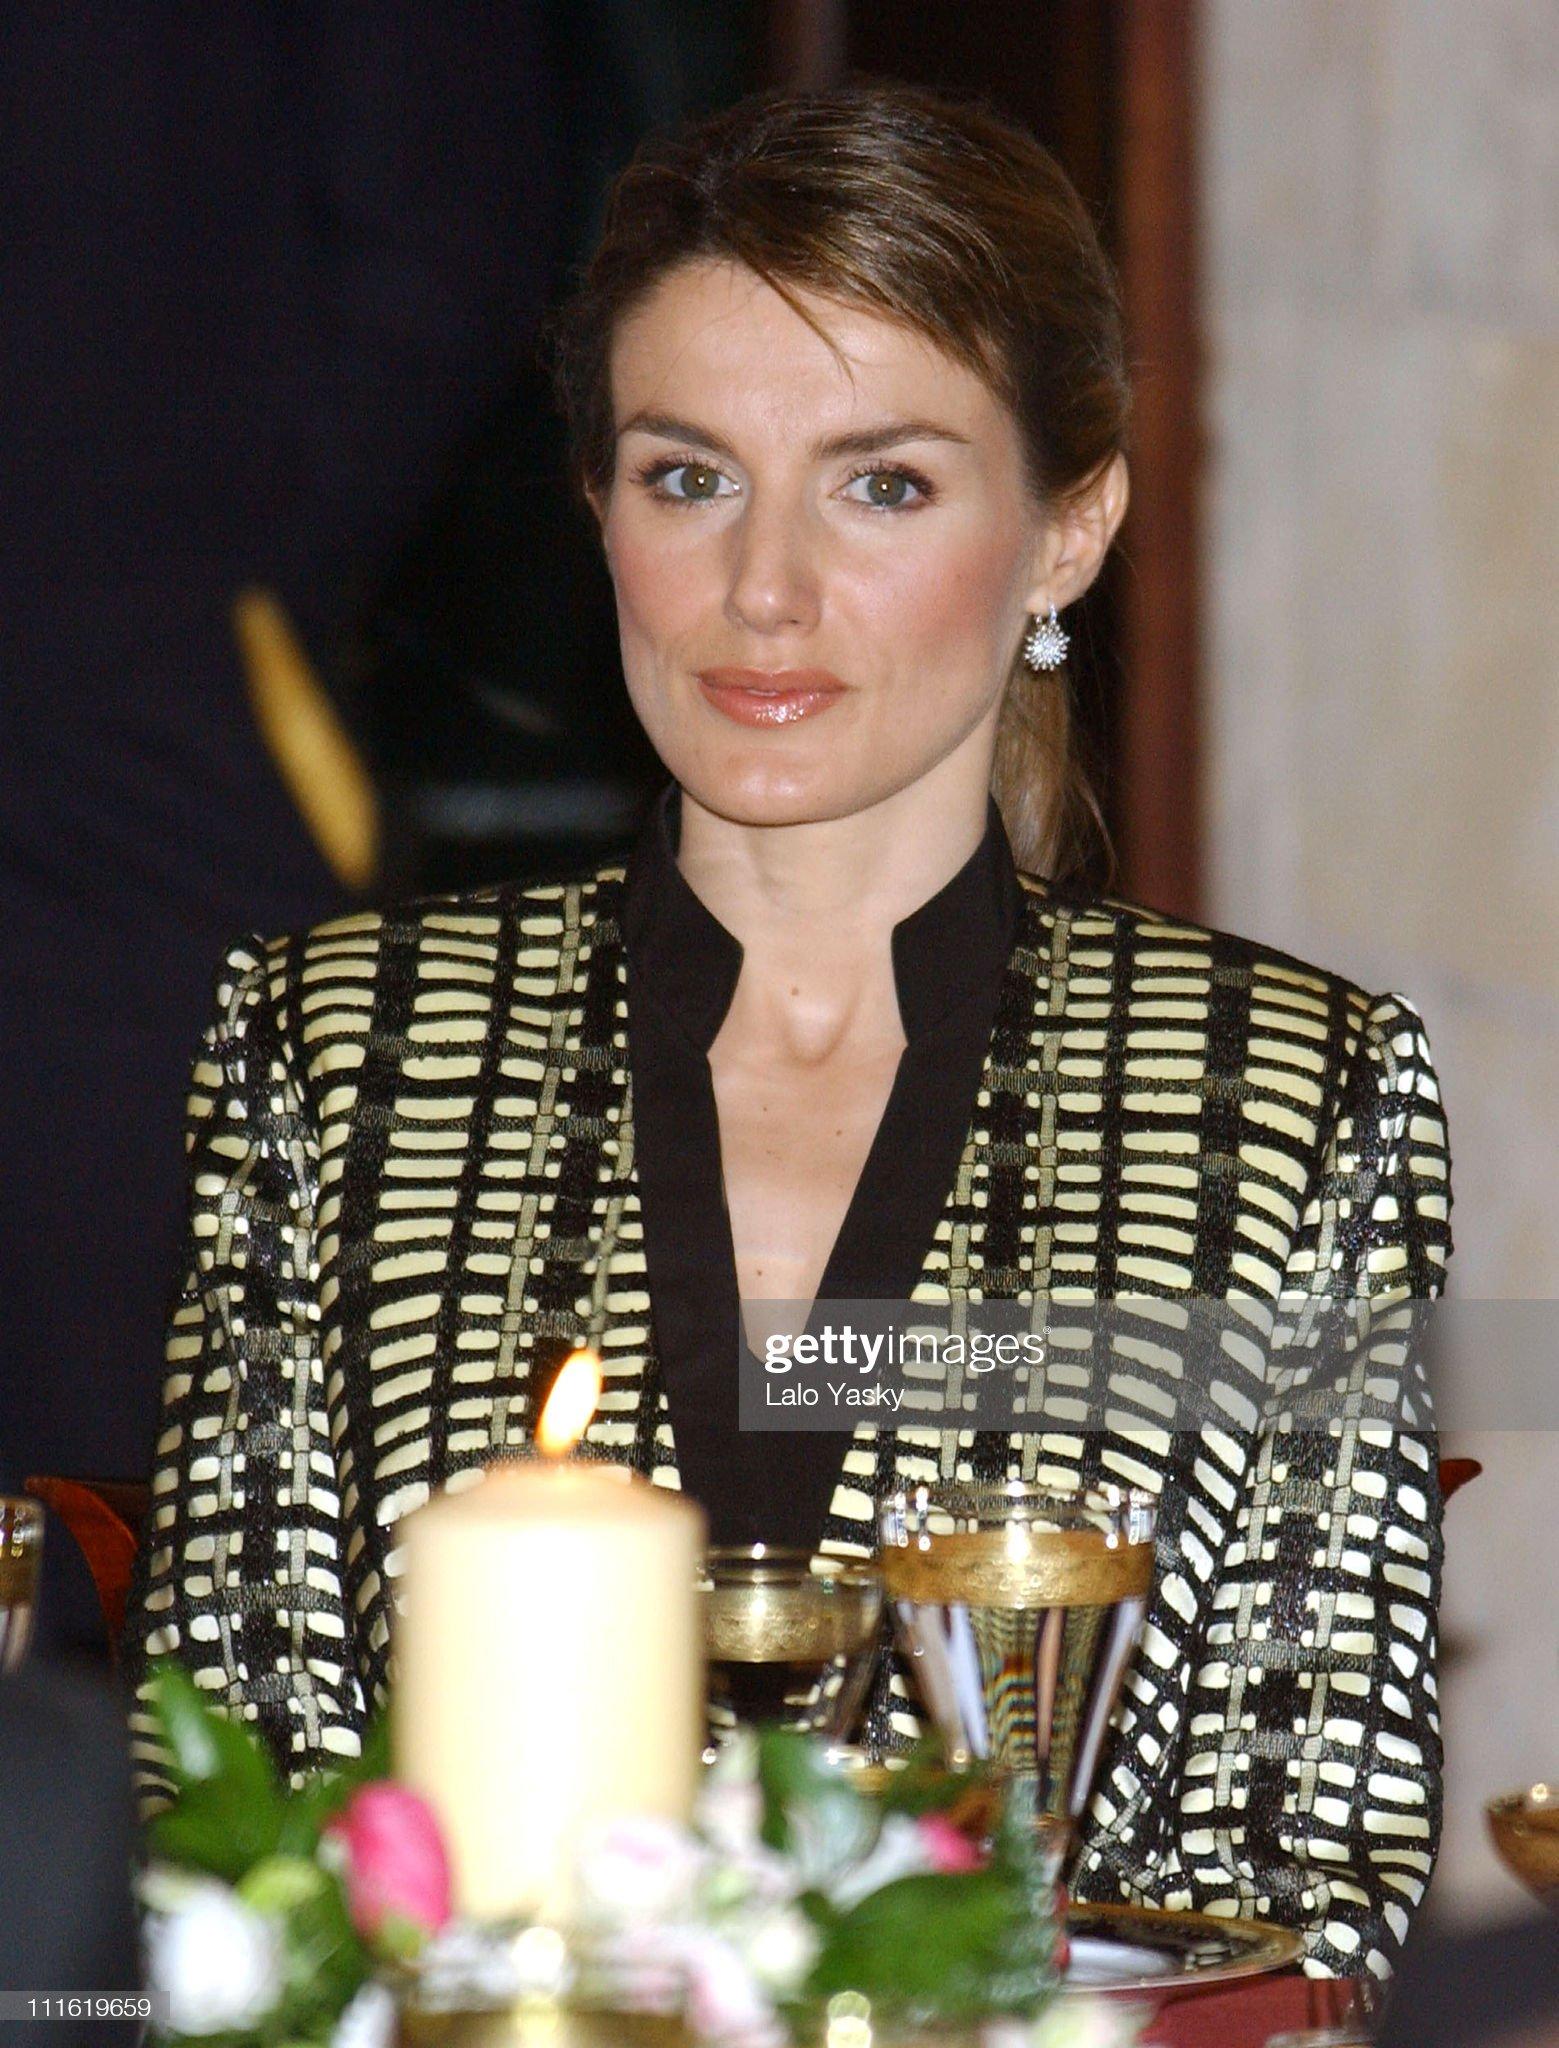 Prince Felipe and Princess Letizia Have Dinner at Almudaina Palace : News Photo